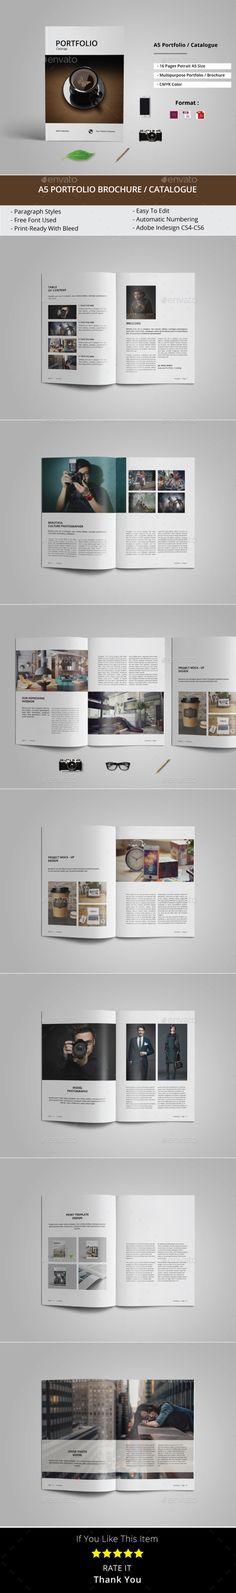 Multipurpose A5 Portfolio - Portfolio Brochures Download here : https://graphicriver.net/item/multipurpose-a5-portfolio/19268426?s_rank=131&ref=Al-fatih